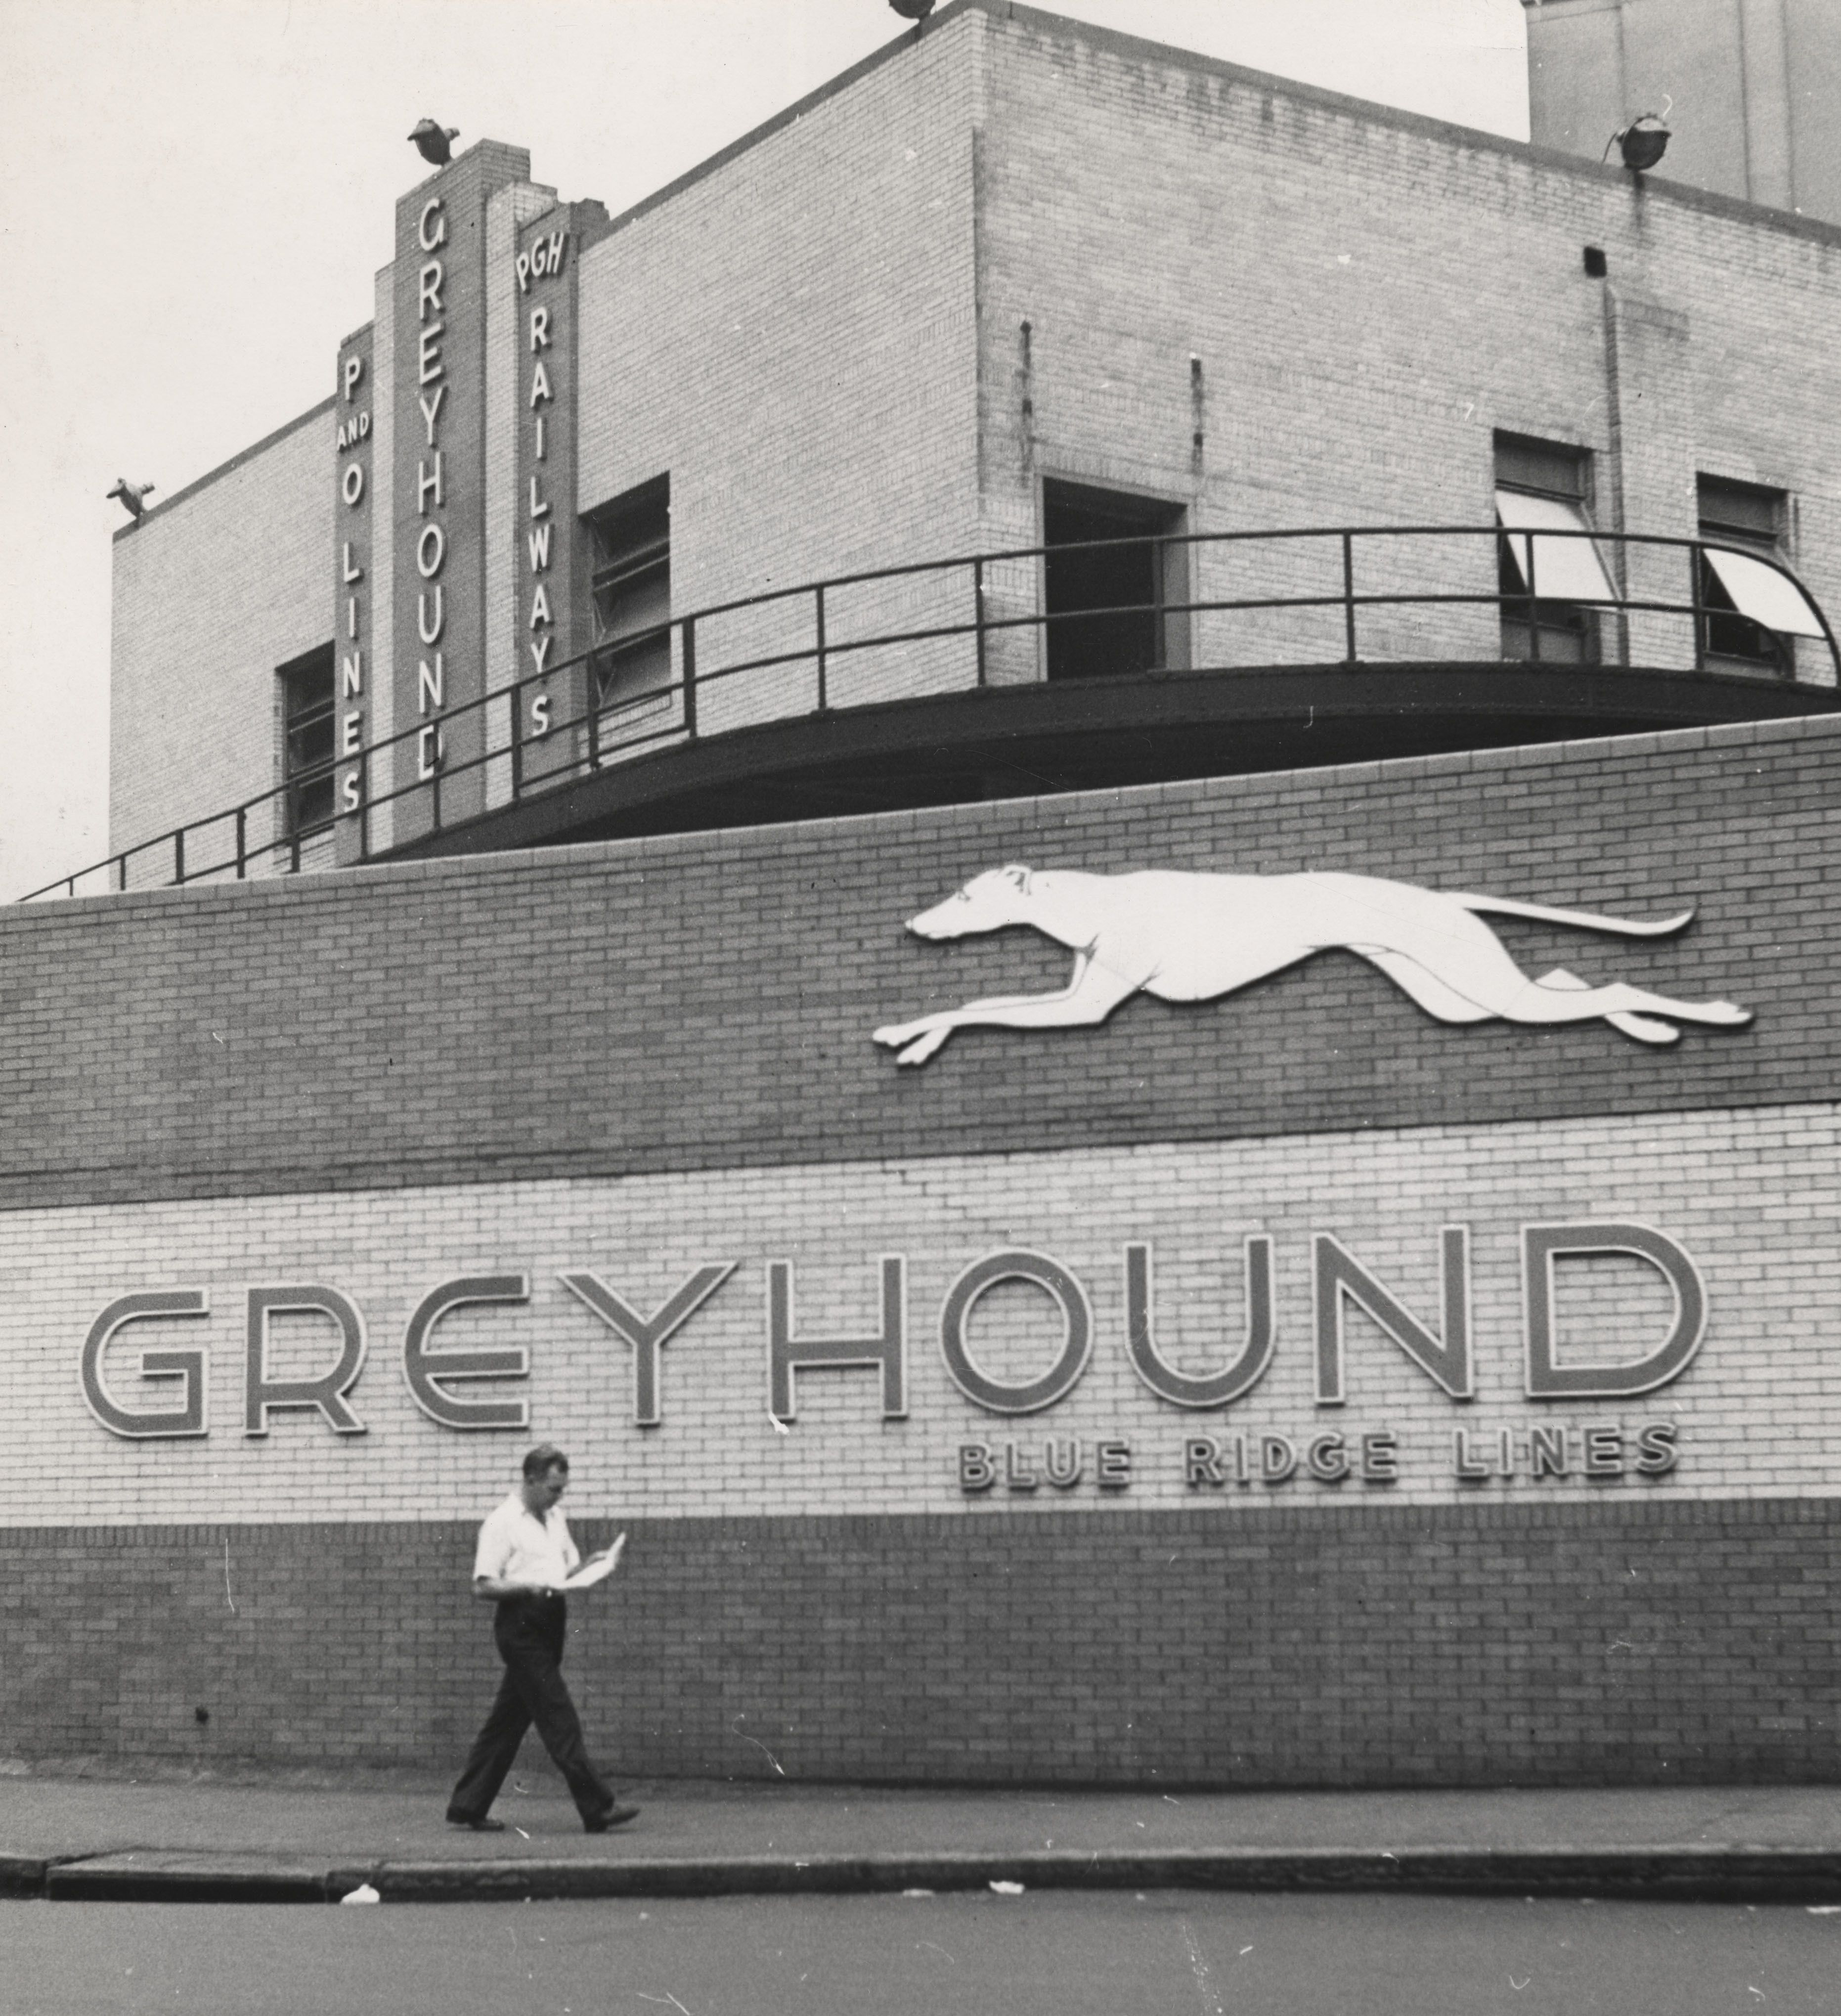 Esther Bubley, Pittsburgh, Pennsylvania. The Exterior of the Greyhound Bus Terminal(Greyhound Bus series)September, 1943 Gelatin silver print